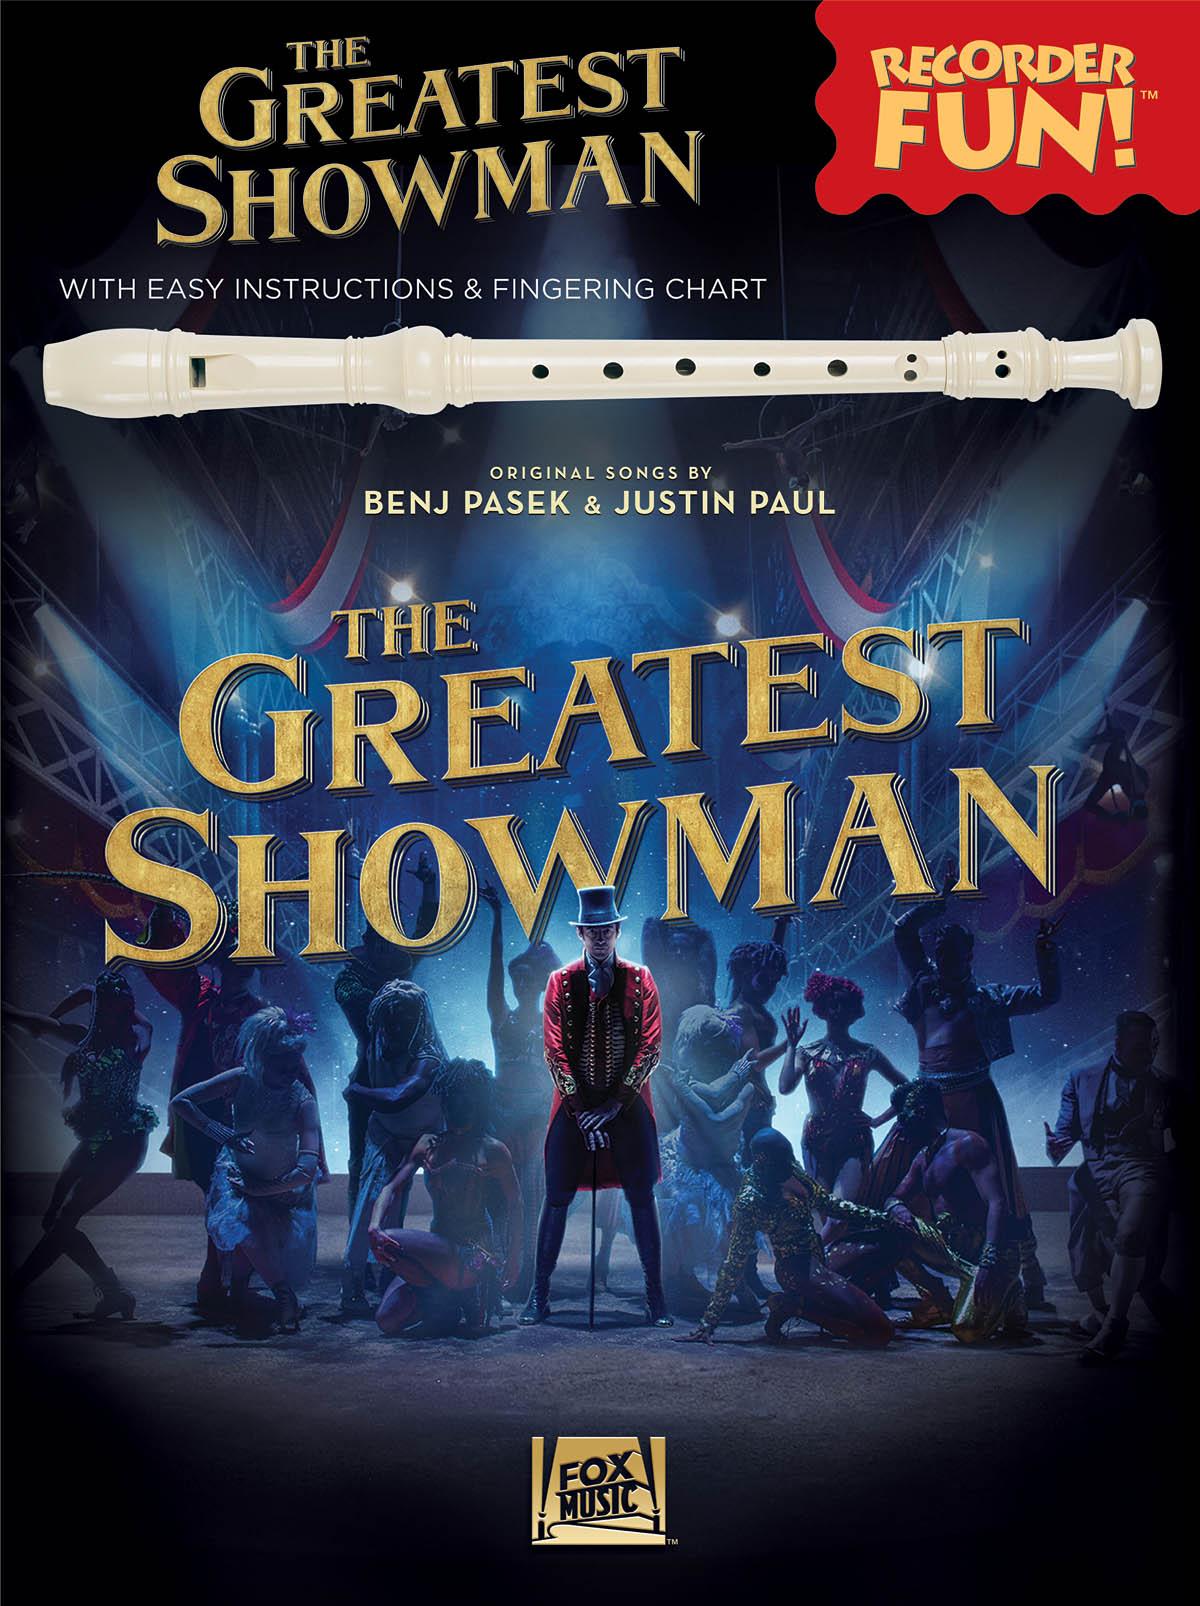 Benj Pasek Justin Paul: The Greatest Showman - Recorder Fun!: Recorder: